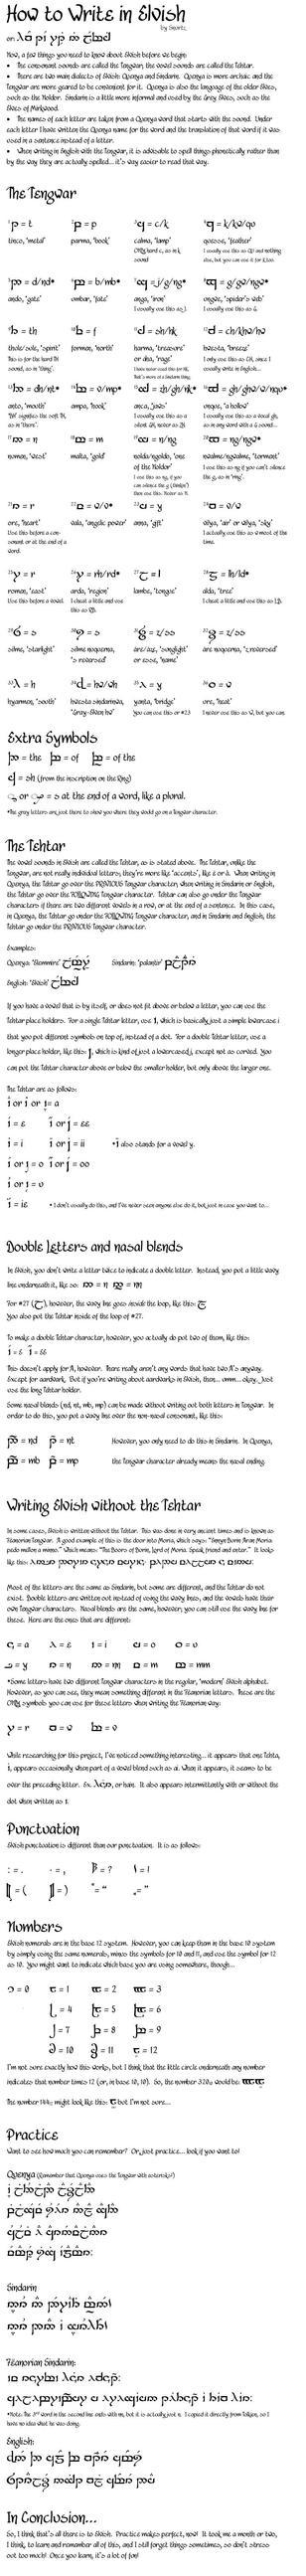 TUTORIAL: How to write Elvish by snurtz